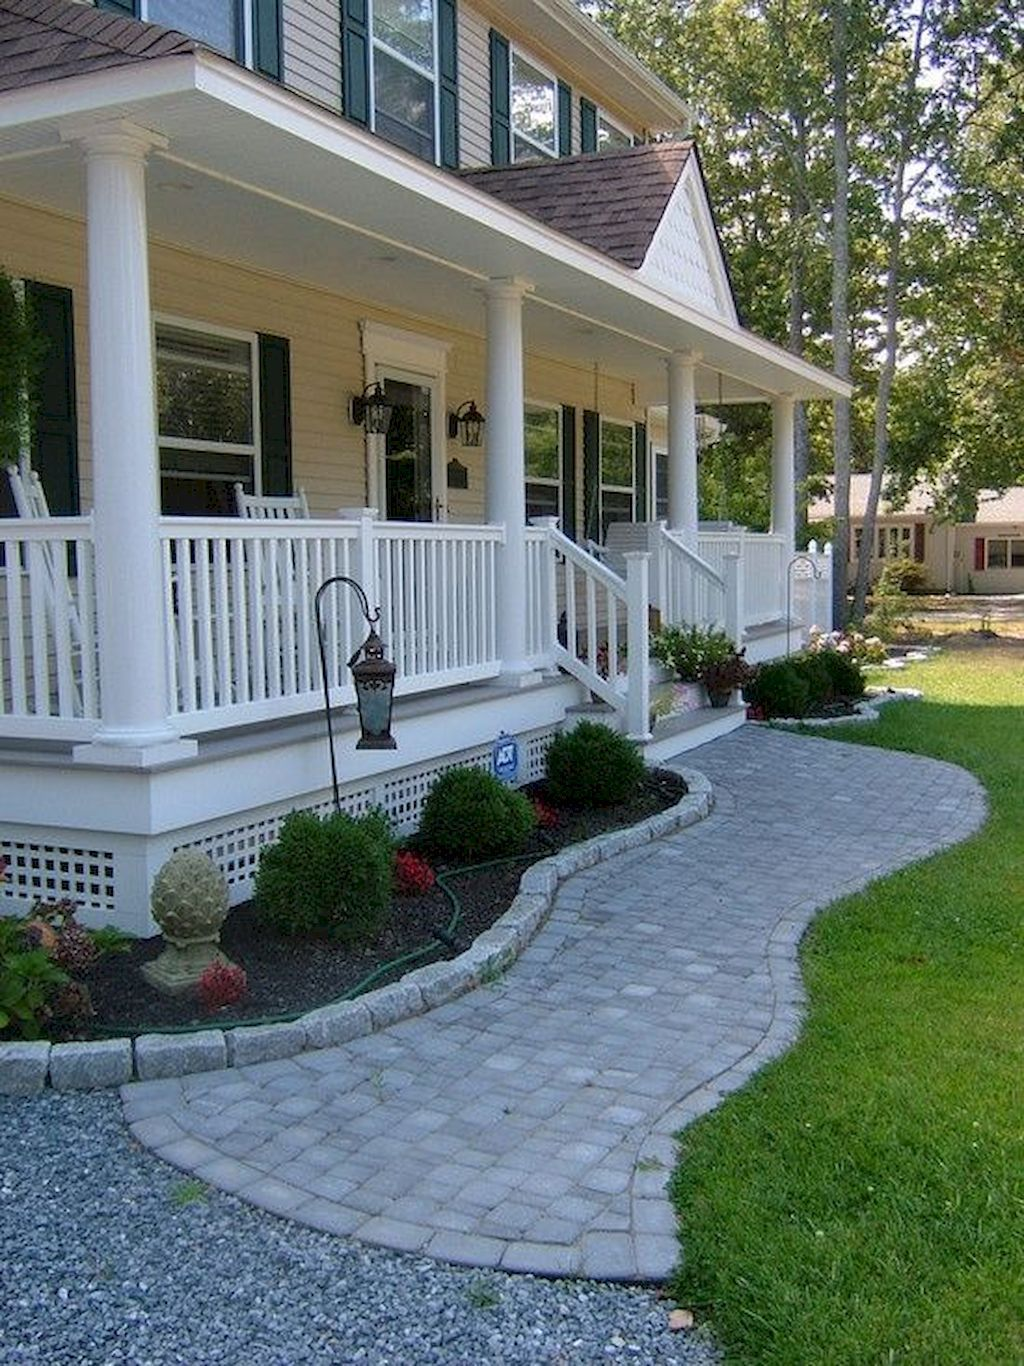 03 Gorgeous Front Yard Garden Landscaping Ideas Farmhouse